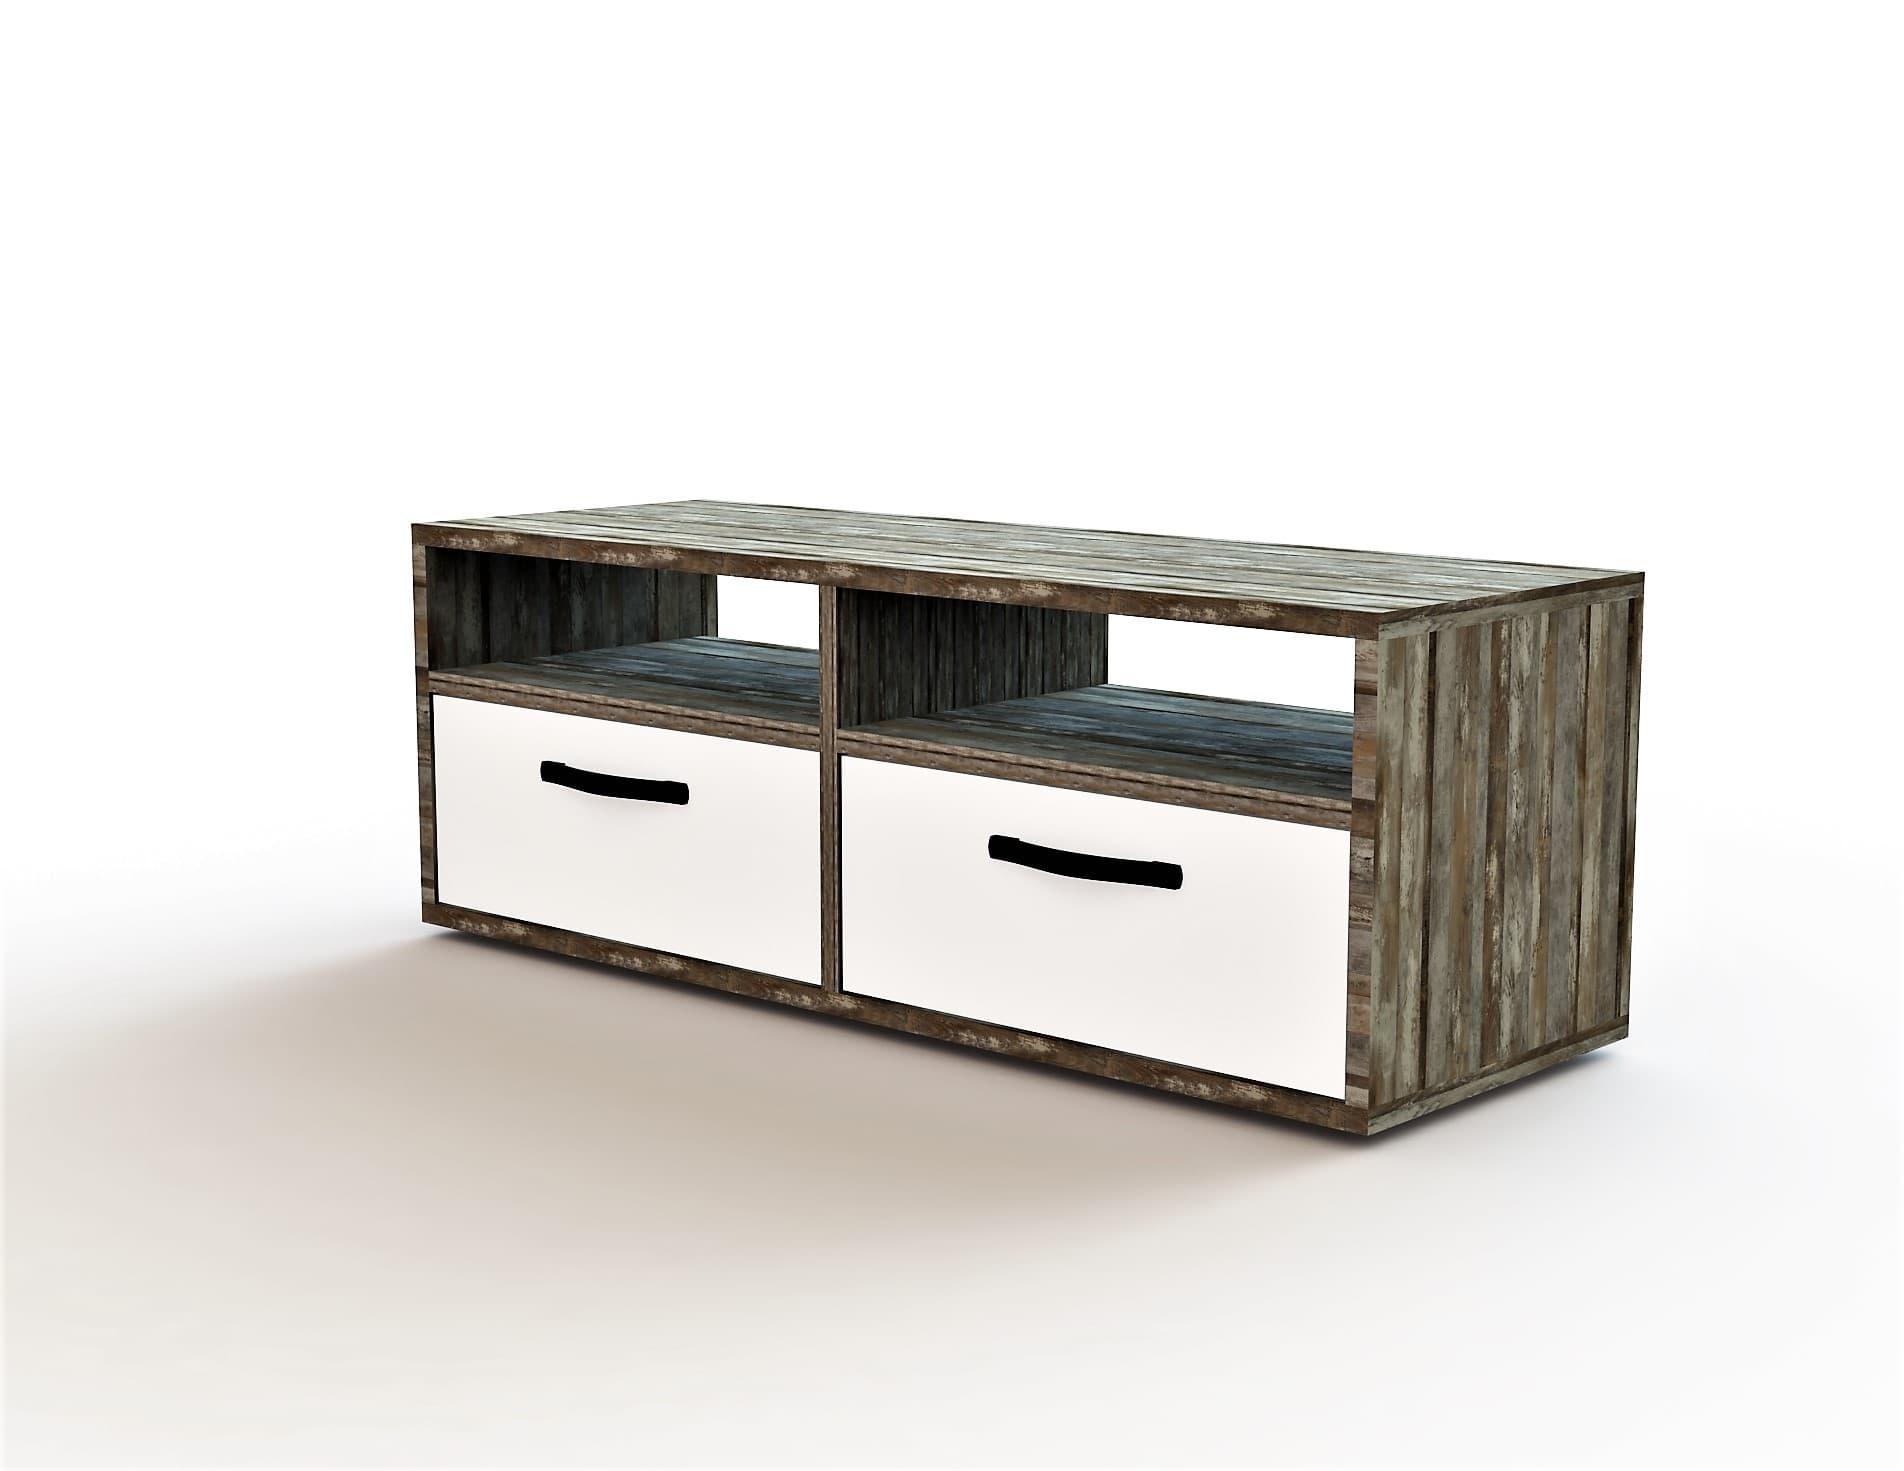 Comoda TV din pal, cu 2 sertare pentru copii Vicky II Alb / Driftwood, l120xA45,5xH45 cm poza